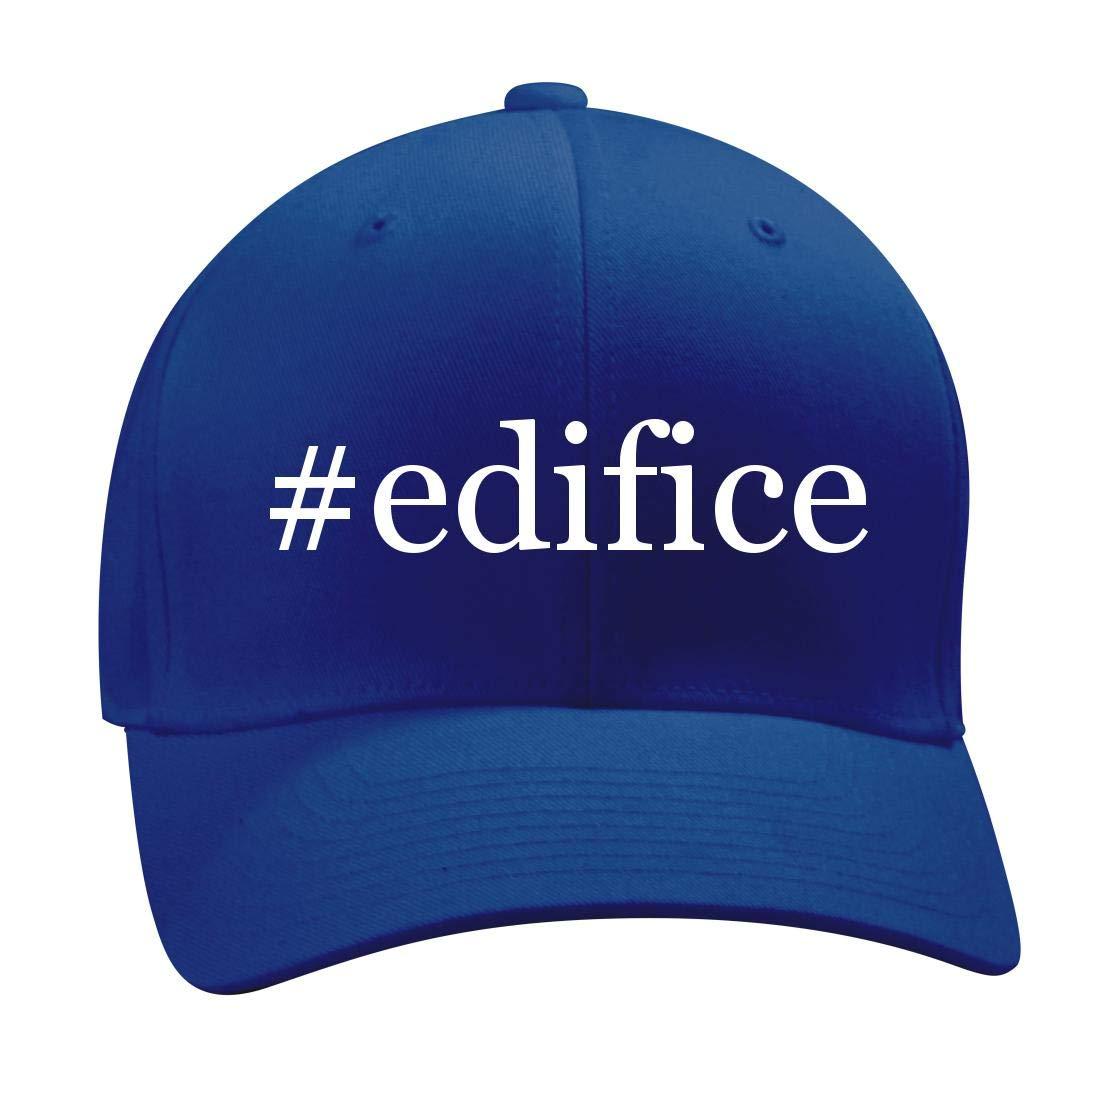 #Edifice - A Nice Hashtag Men's Adult Baseball Hat Cap, Blue, Small/Medium by Shirt Me Up